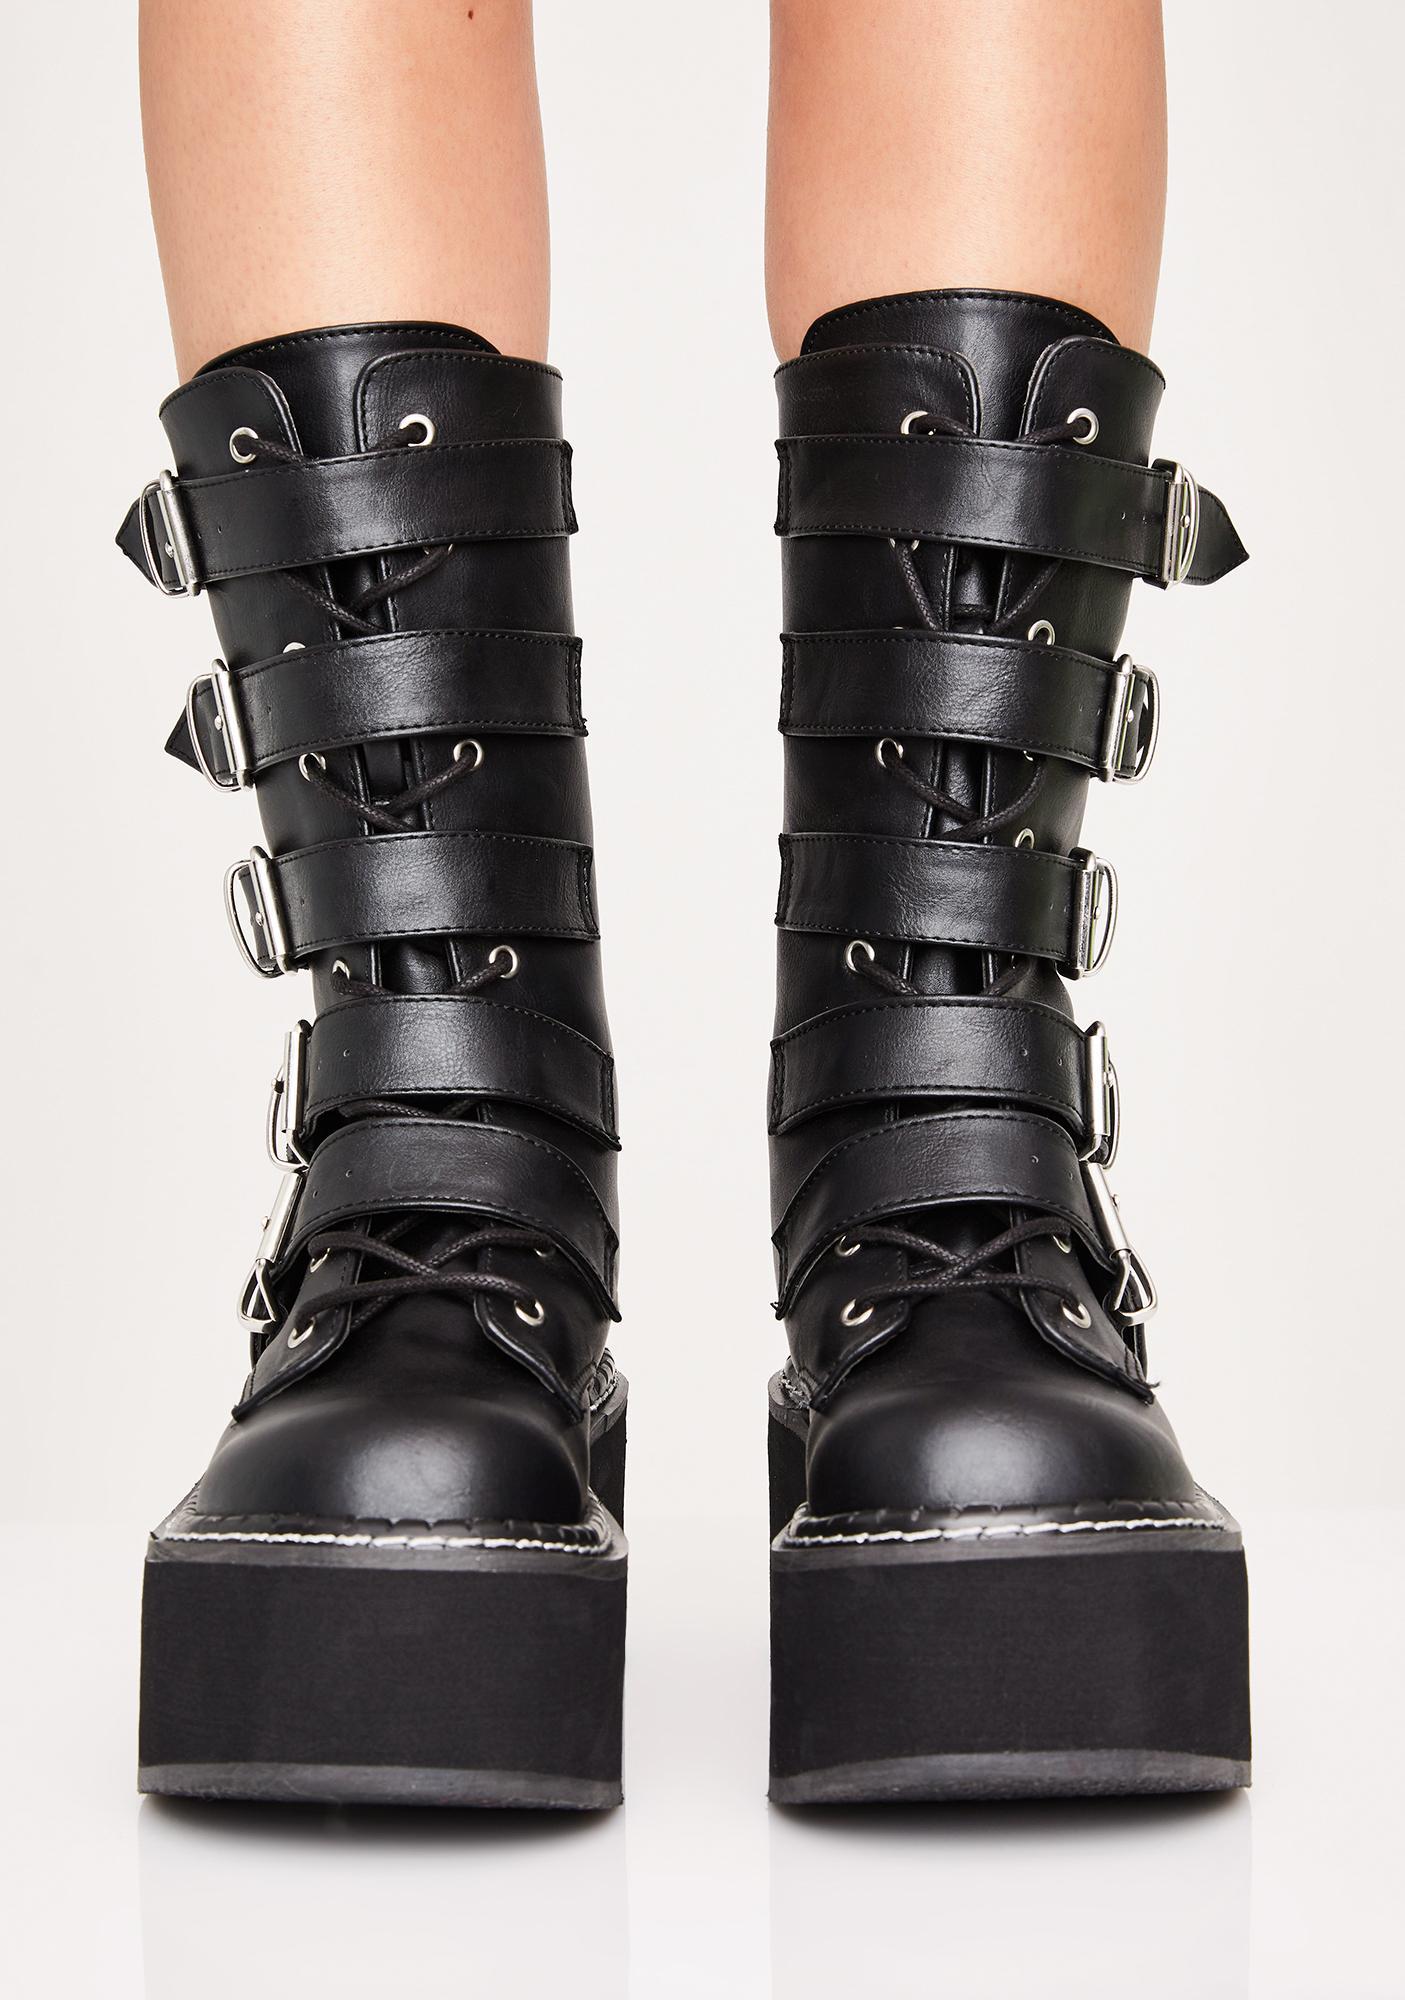 Demonia Armageddon Boots